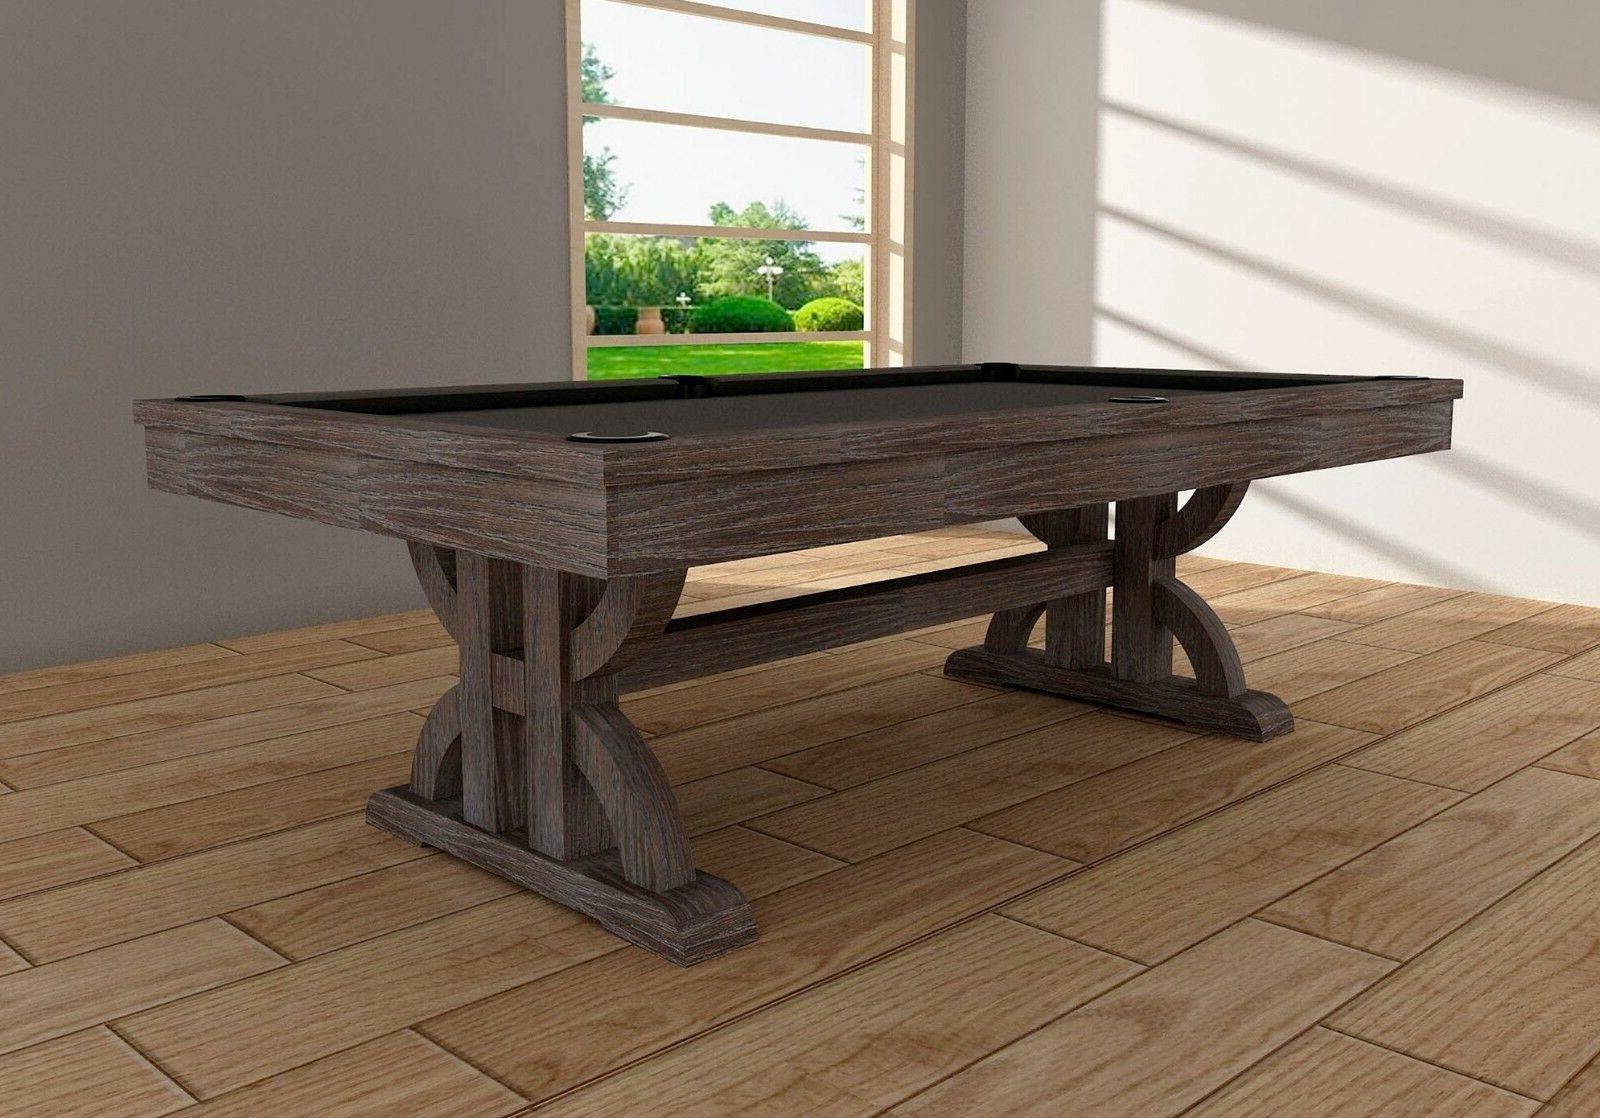 drummond pool table by 8 weathered dark